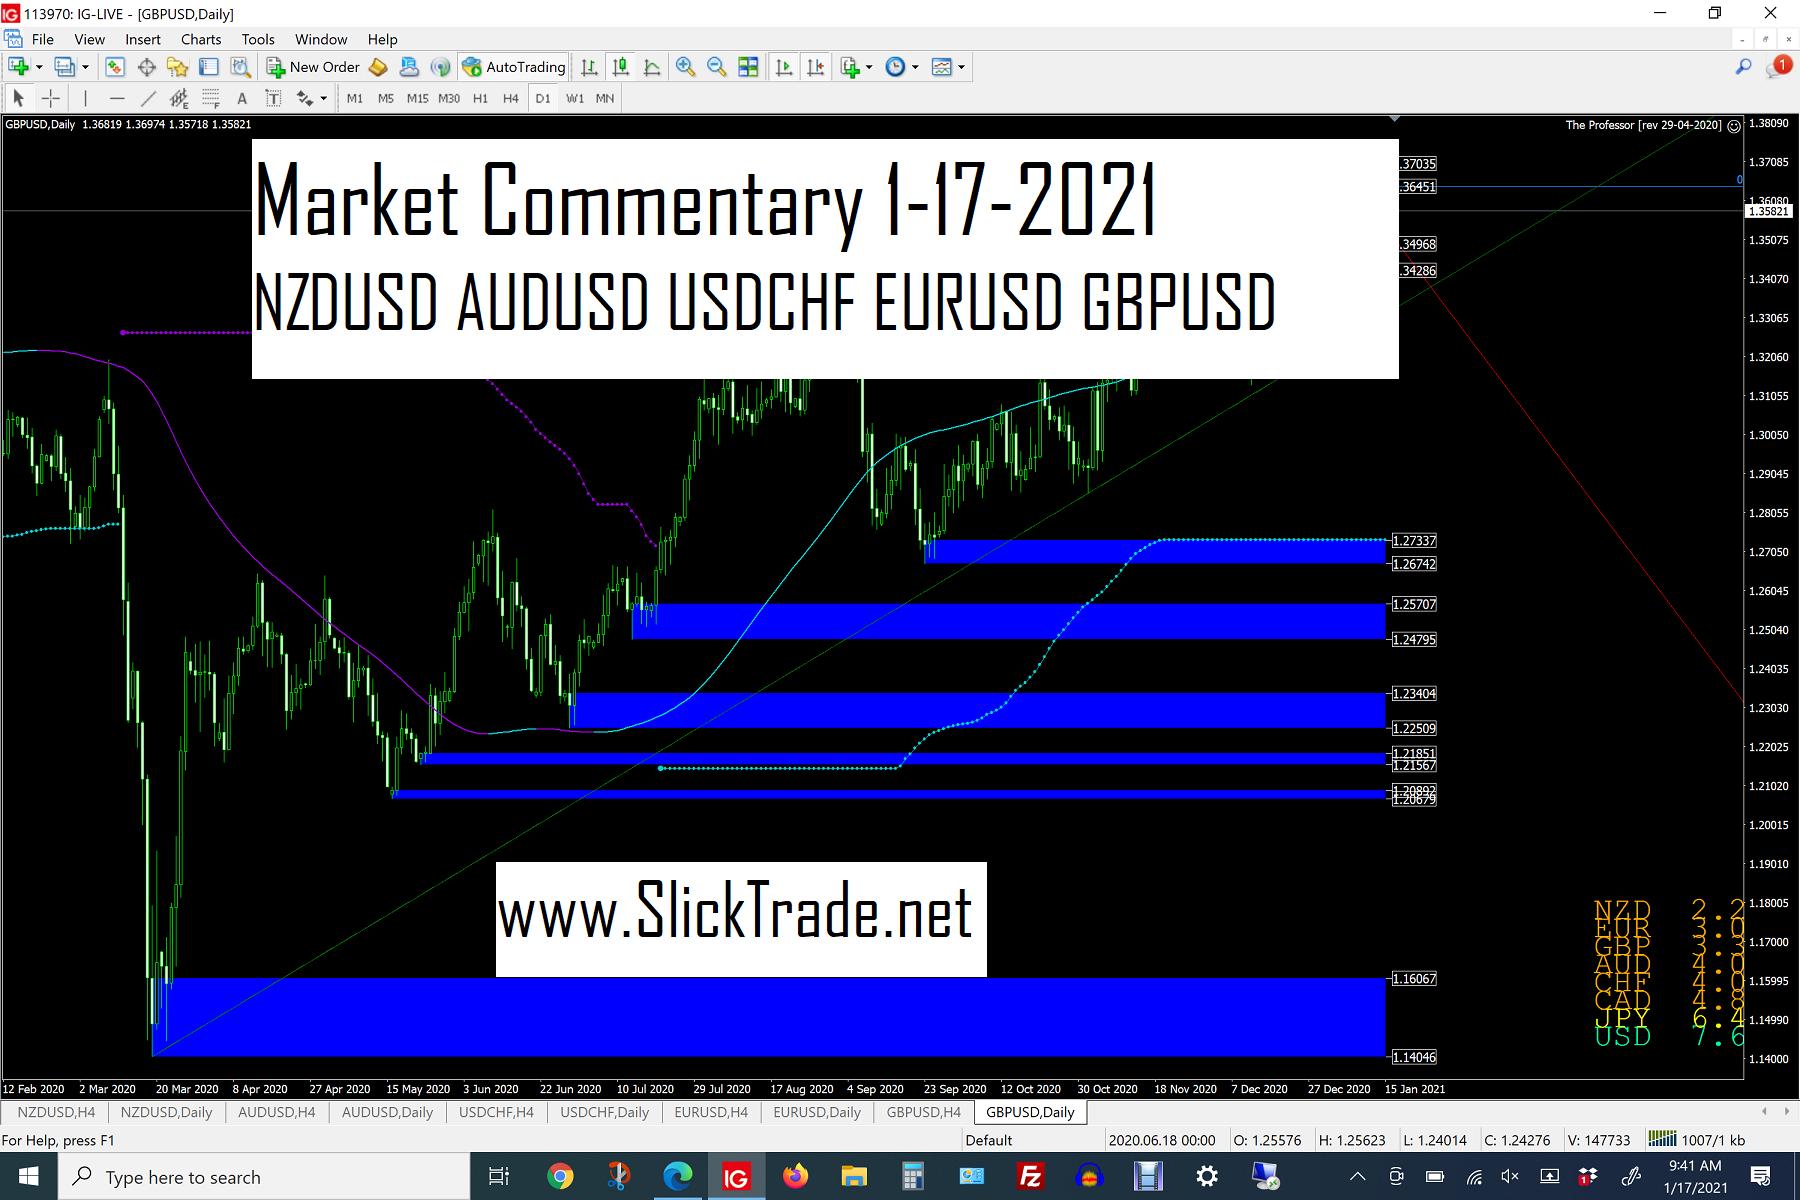 Market Commentary 1-17-2021 - NZDUSD AUDUSD USDCHF EURUSD GBPUSD